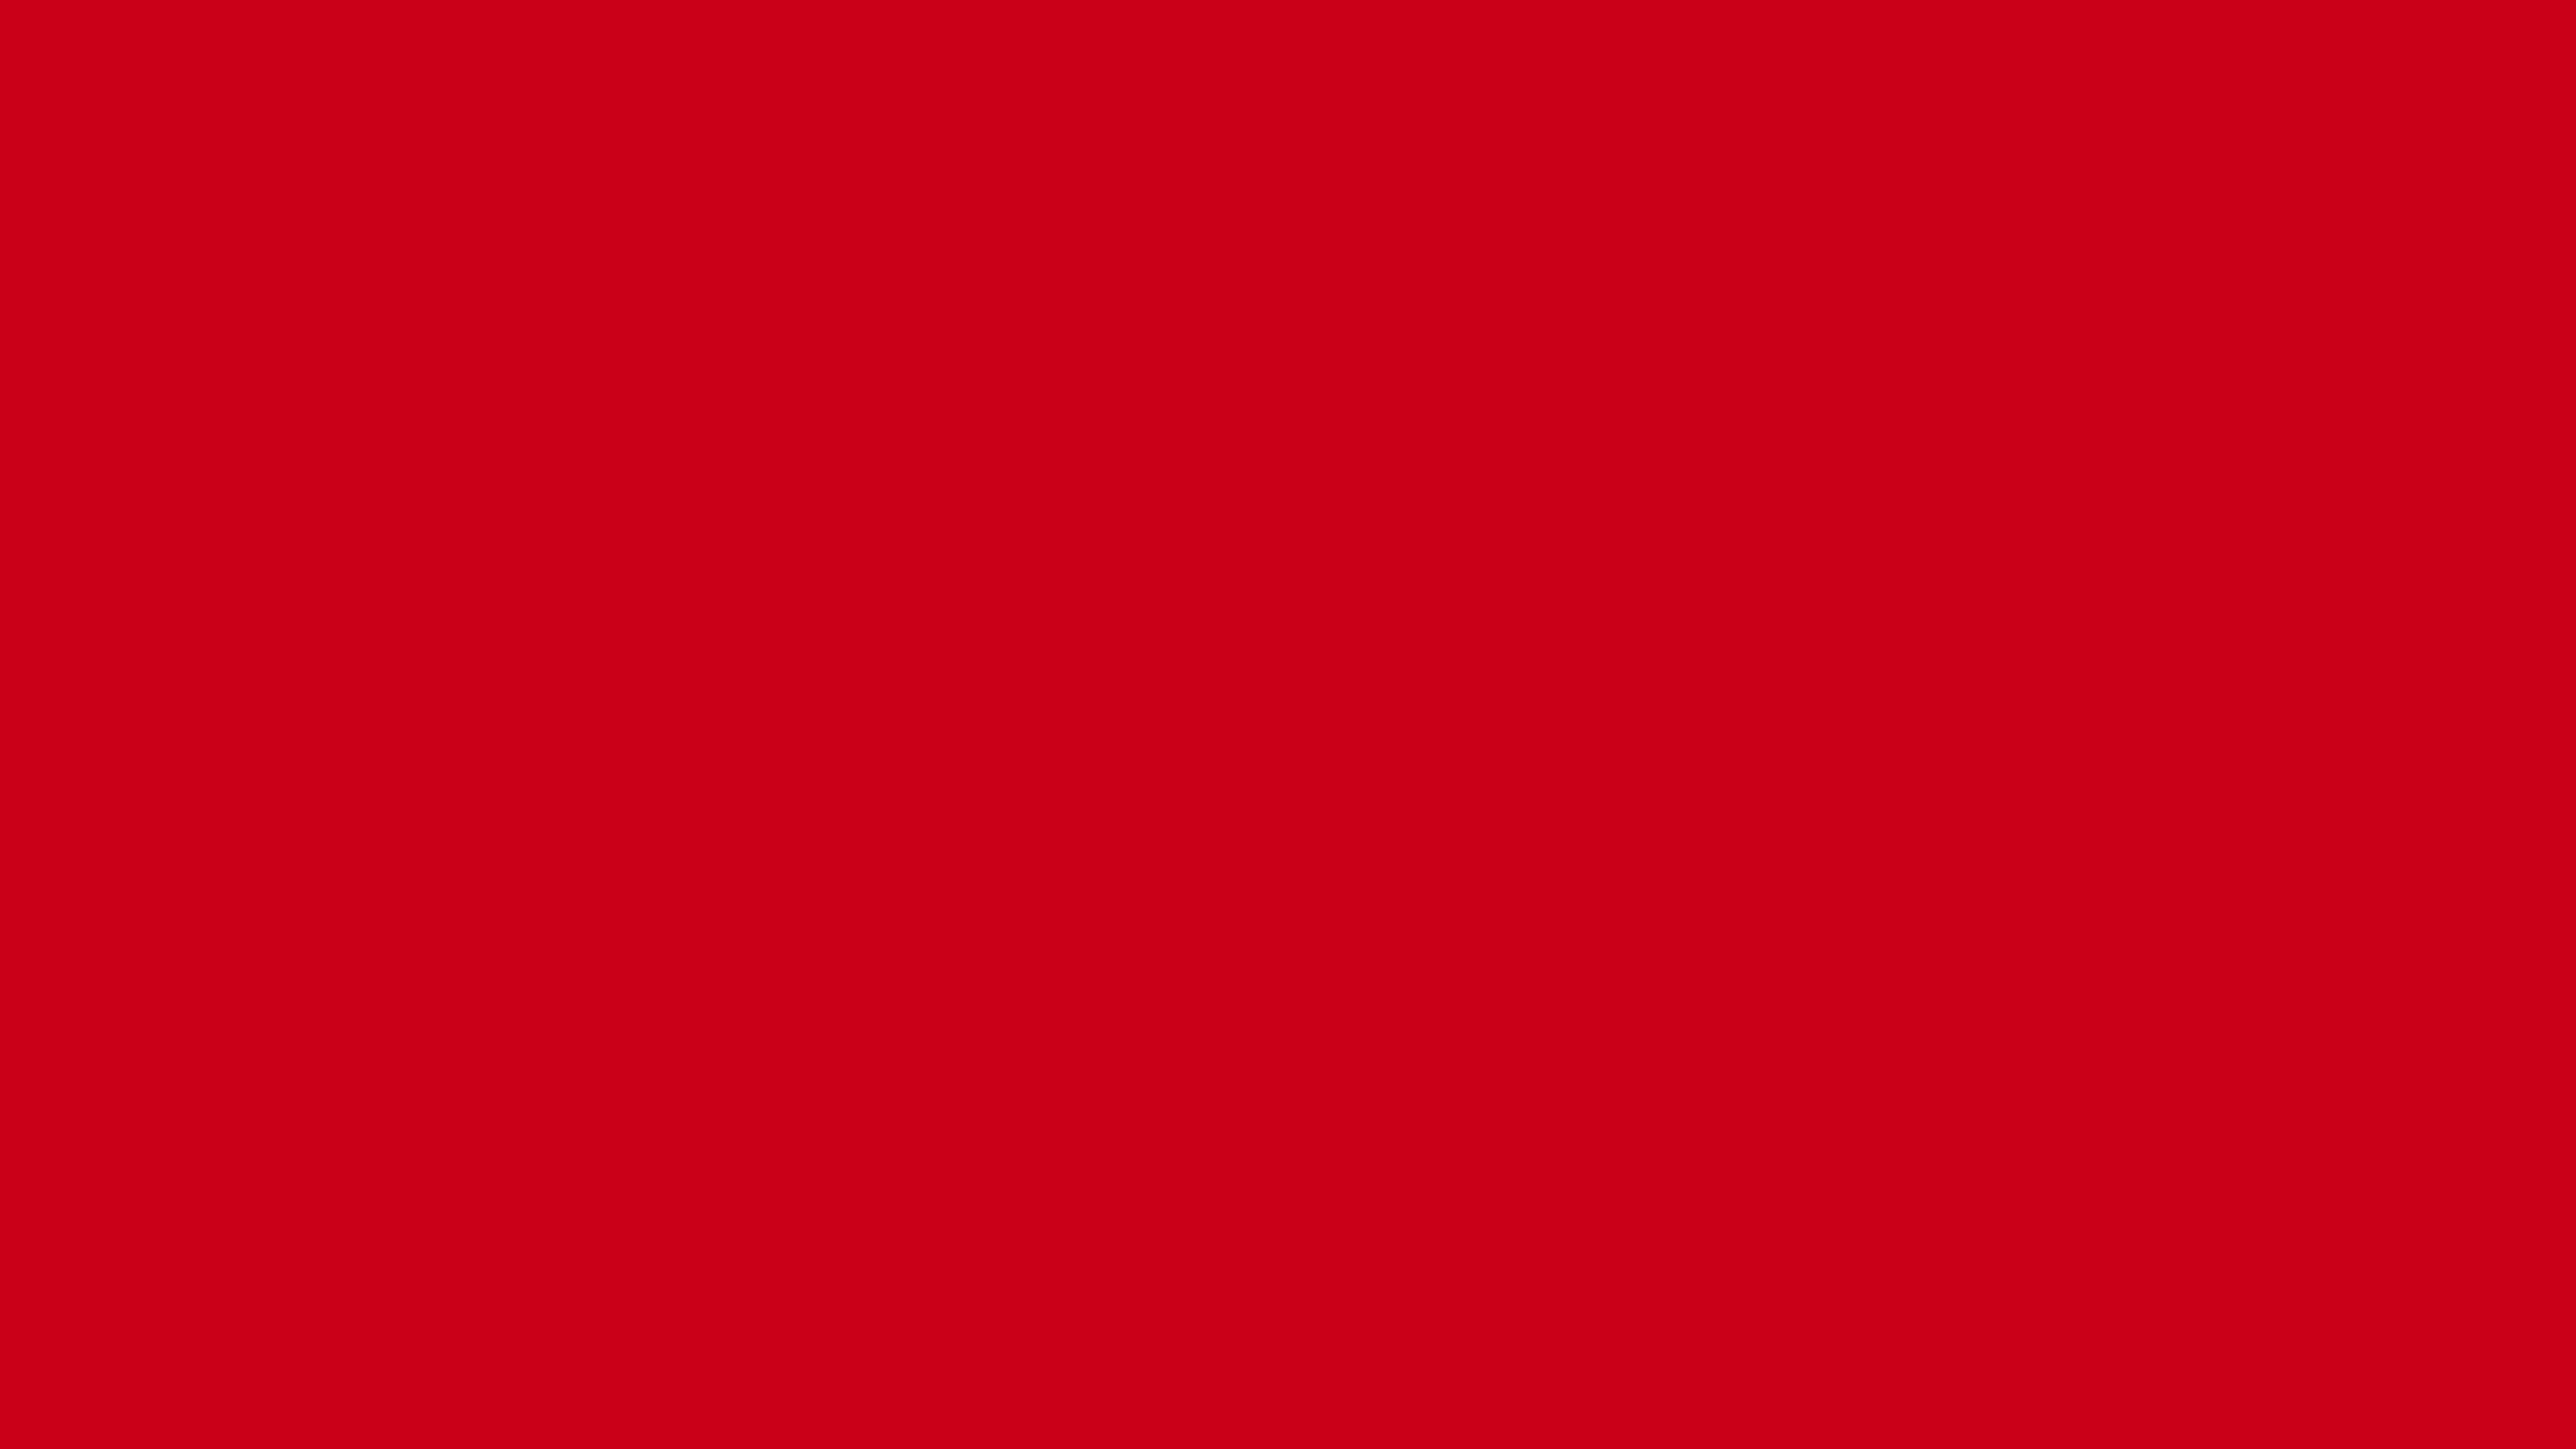 4096x2304 Harvard Crimson Solid Color Background